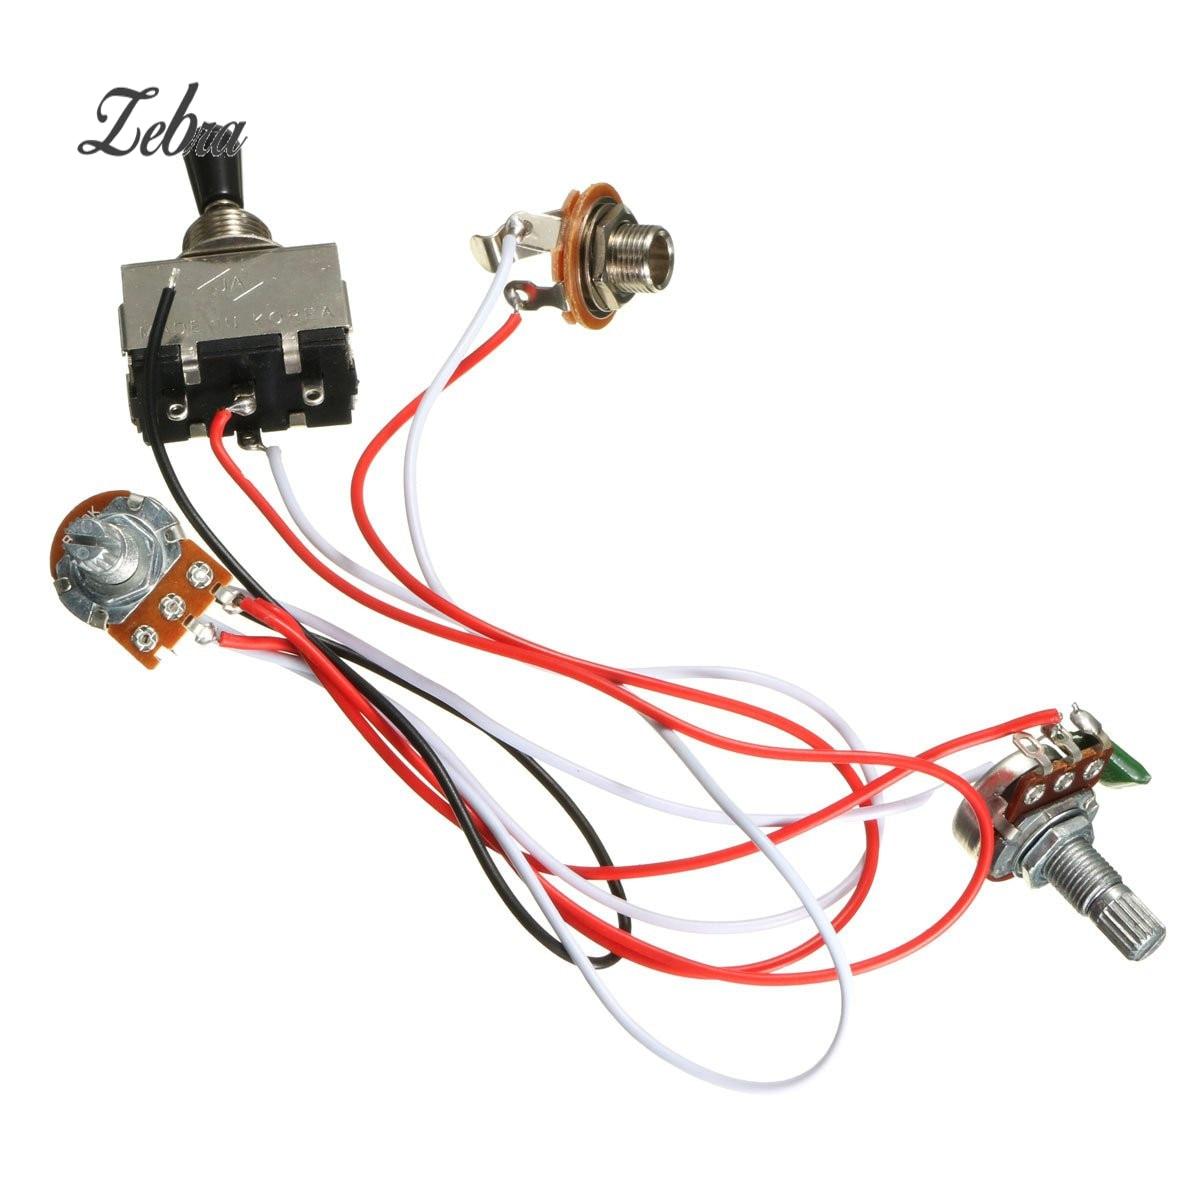 3 pcs set metal plastic electric guitar sound switch guitar volume tone control shift wiring harness [ 1200 x 1200 Pixel ]